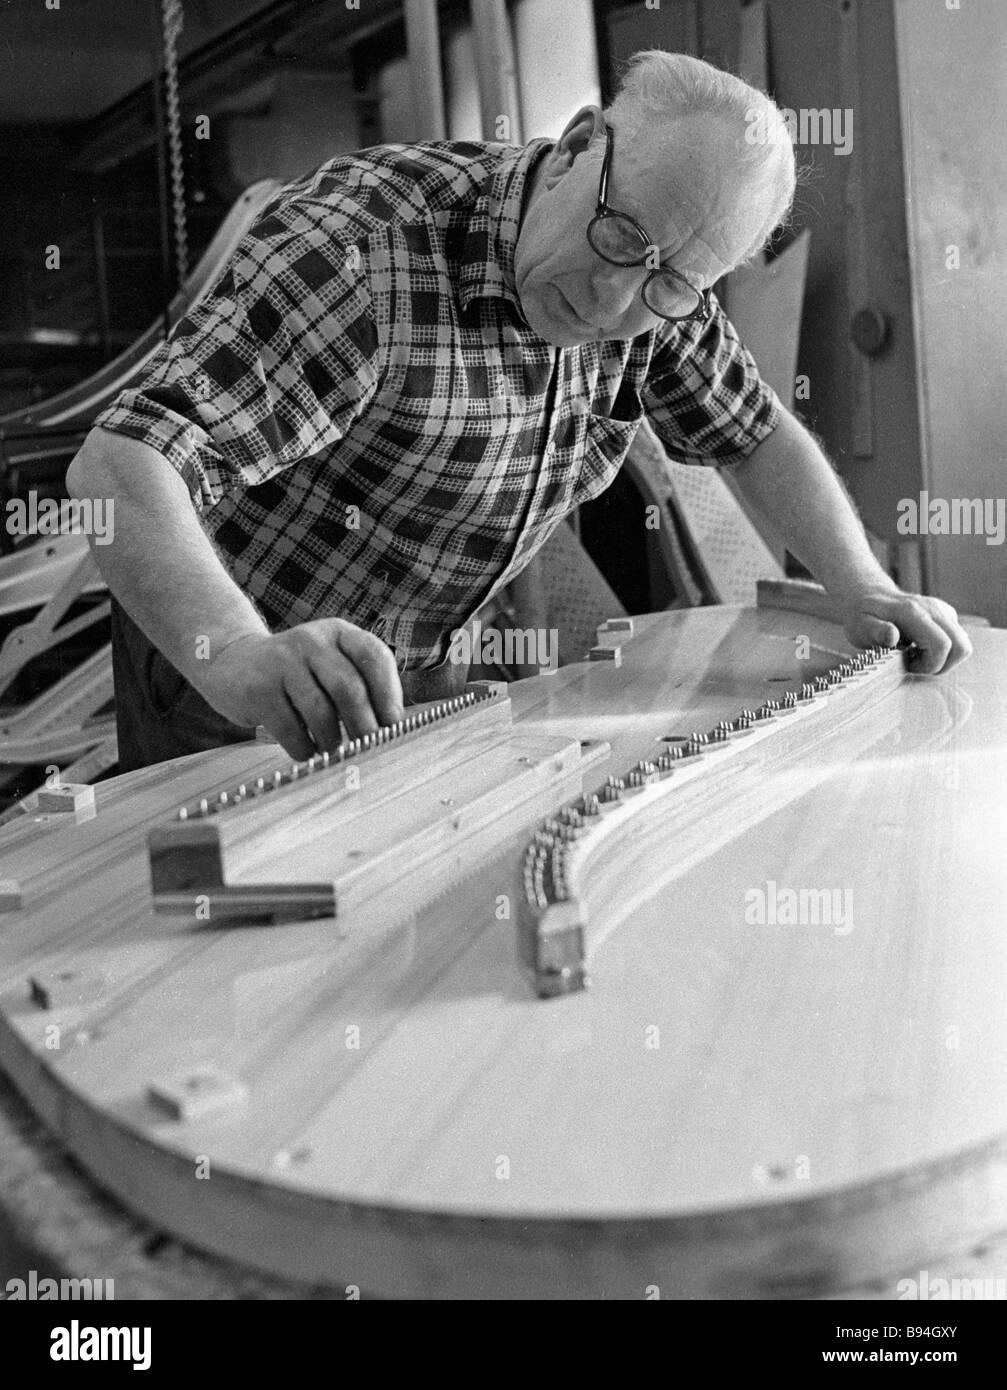 Piano maker Ilo Polakes installing a string palte - Stock Image